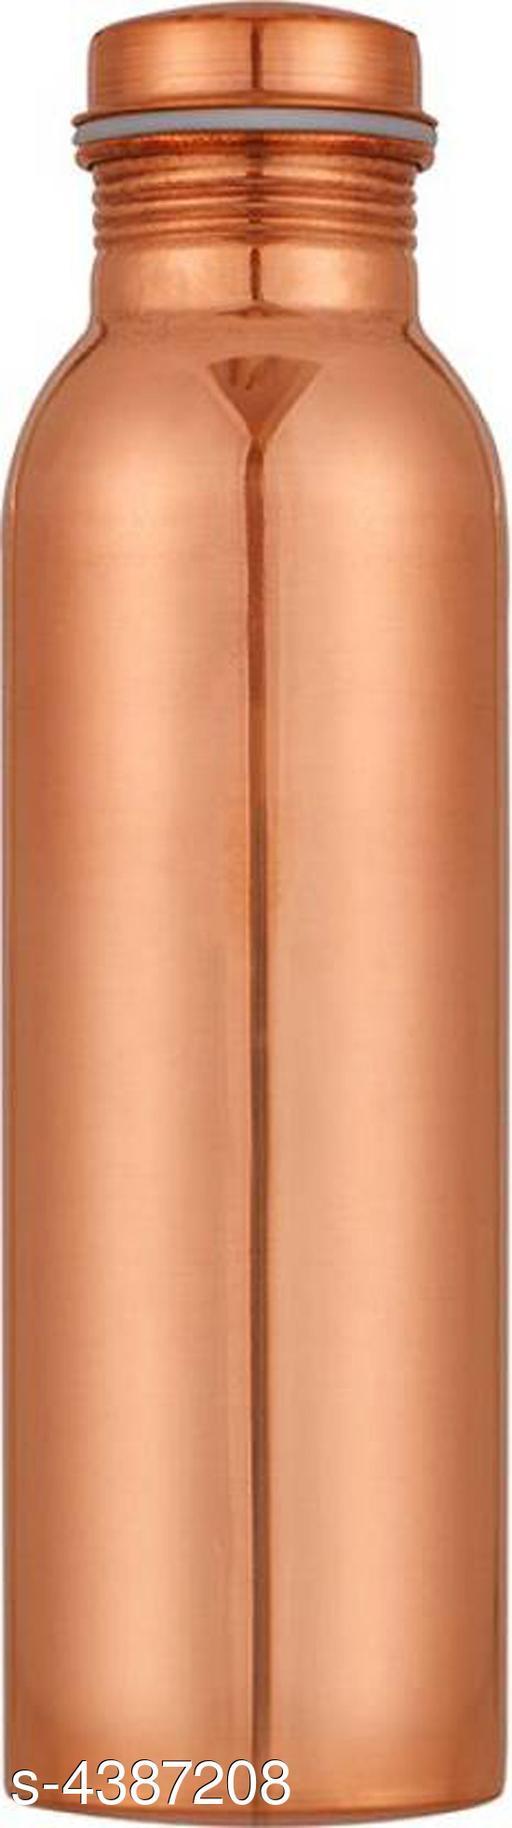 Stylish Copper Bottles